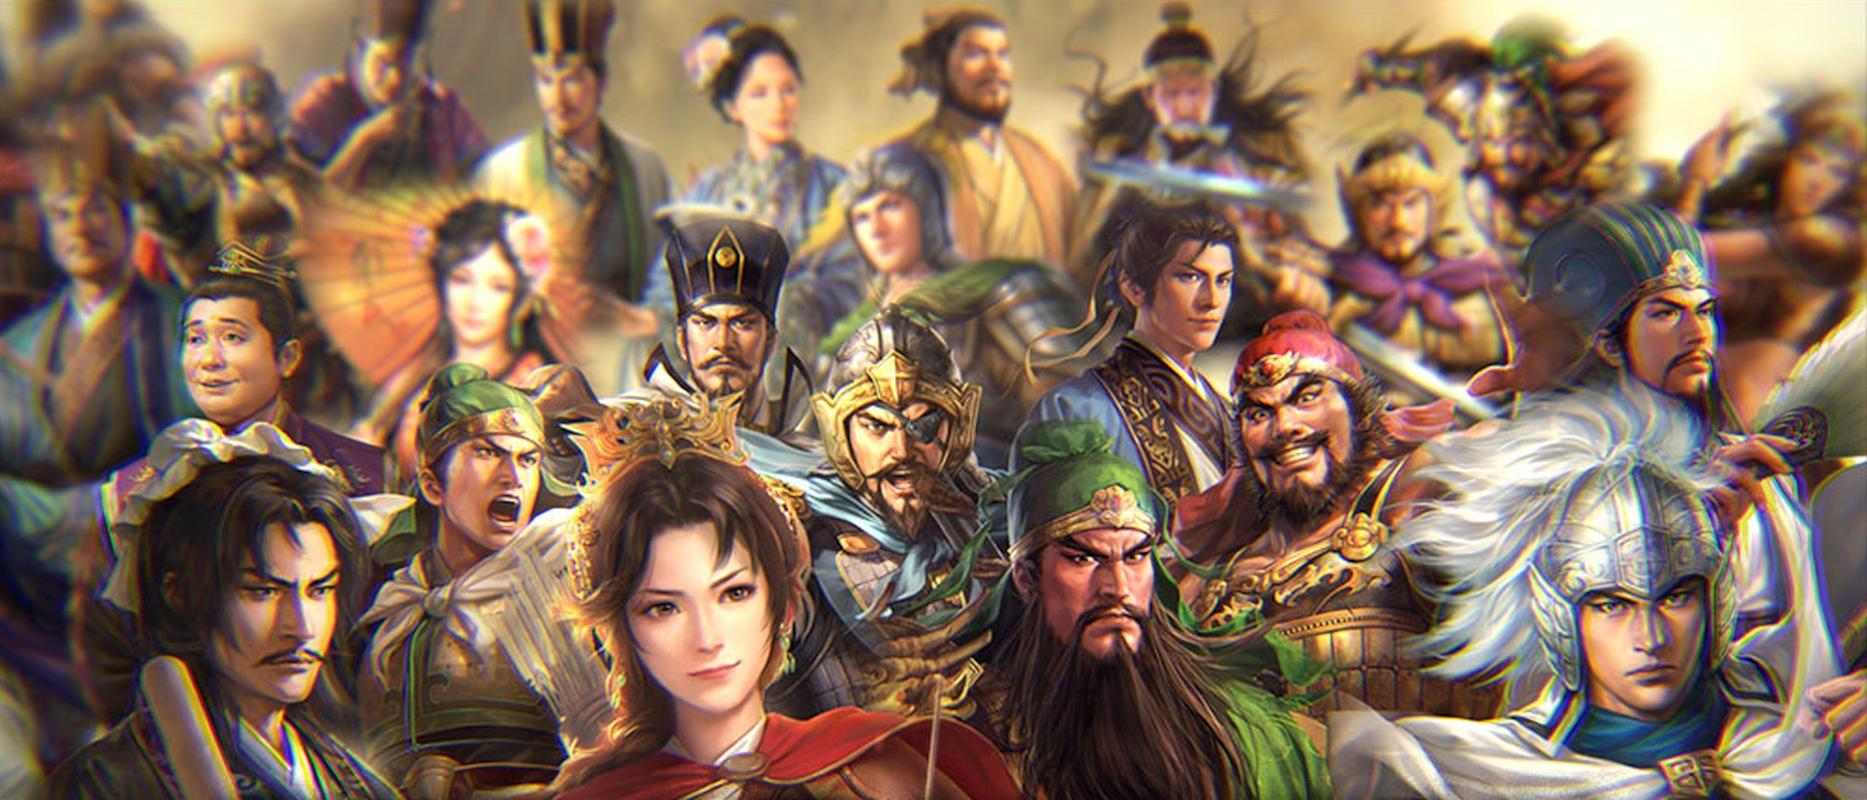 Romance of the Three Kingdoms XIV Original Scenario Contest Announced